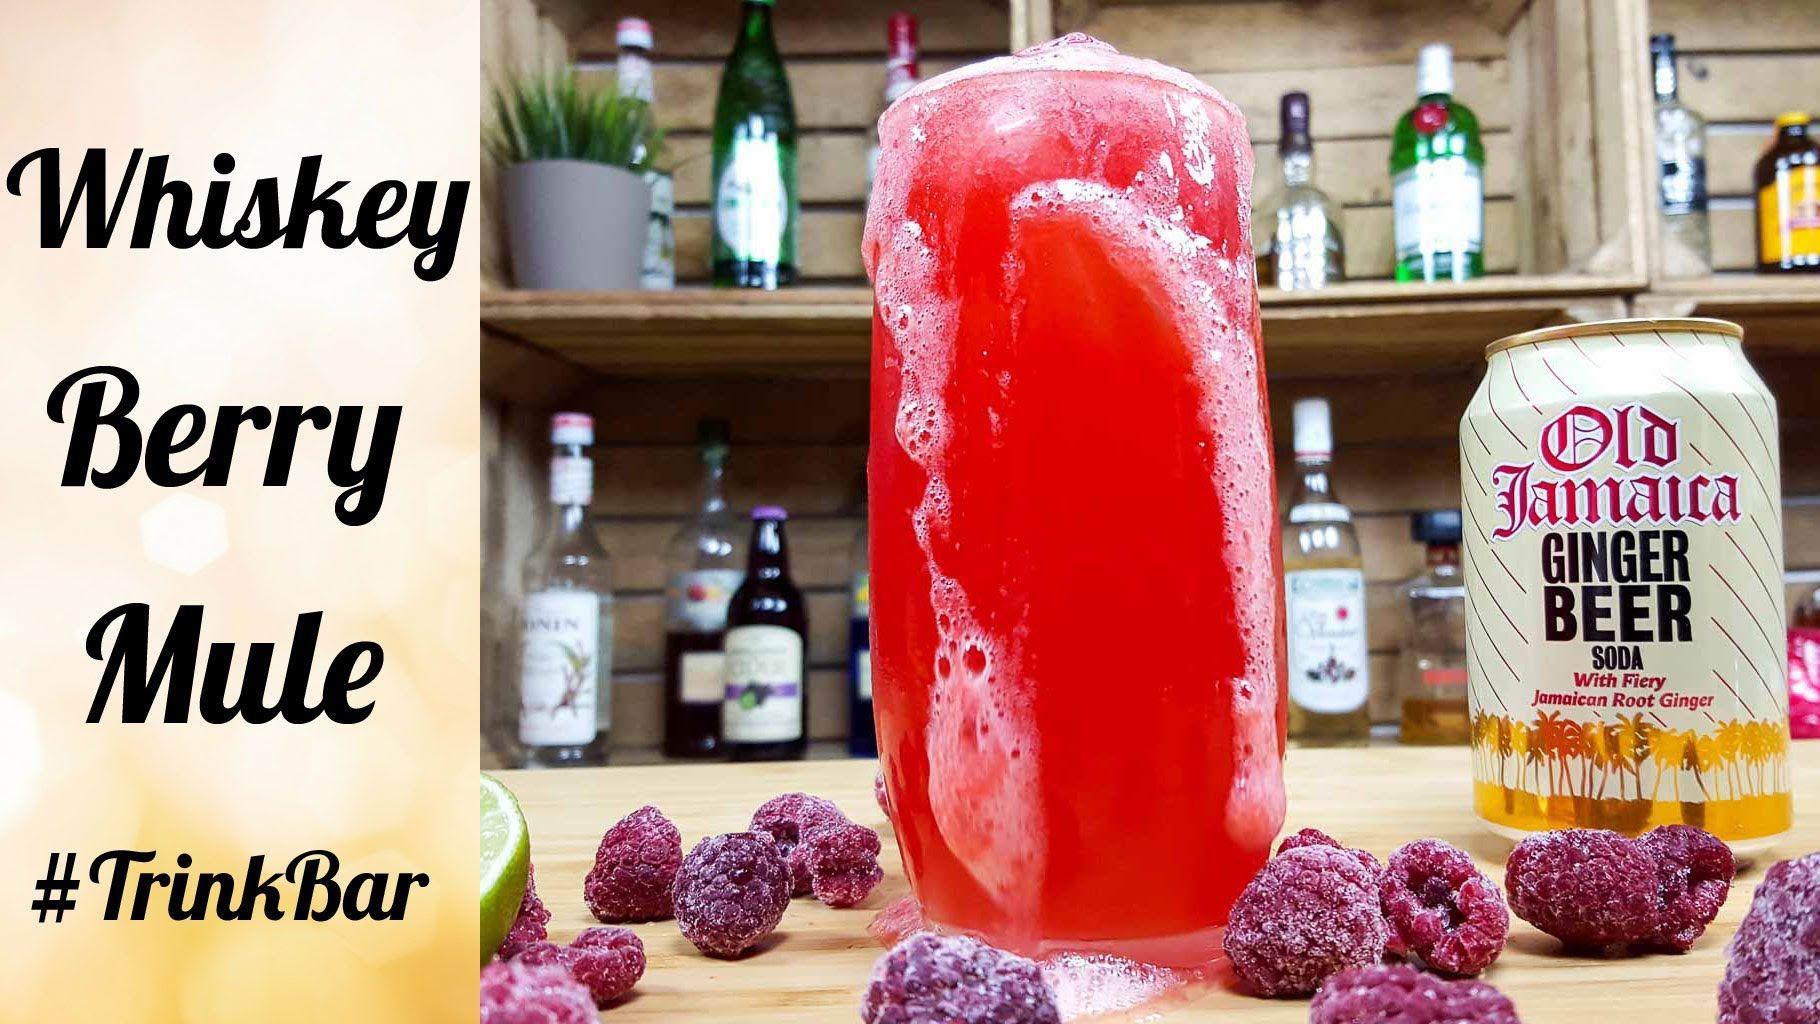 Whiskey Berry Mule - Cocktail - Rezept - Trinkbar